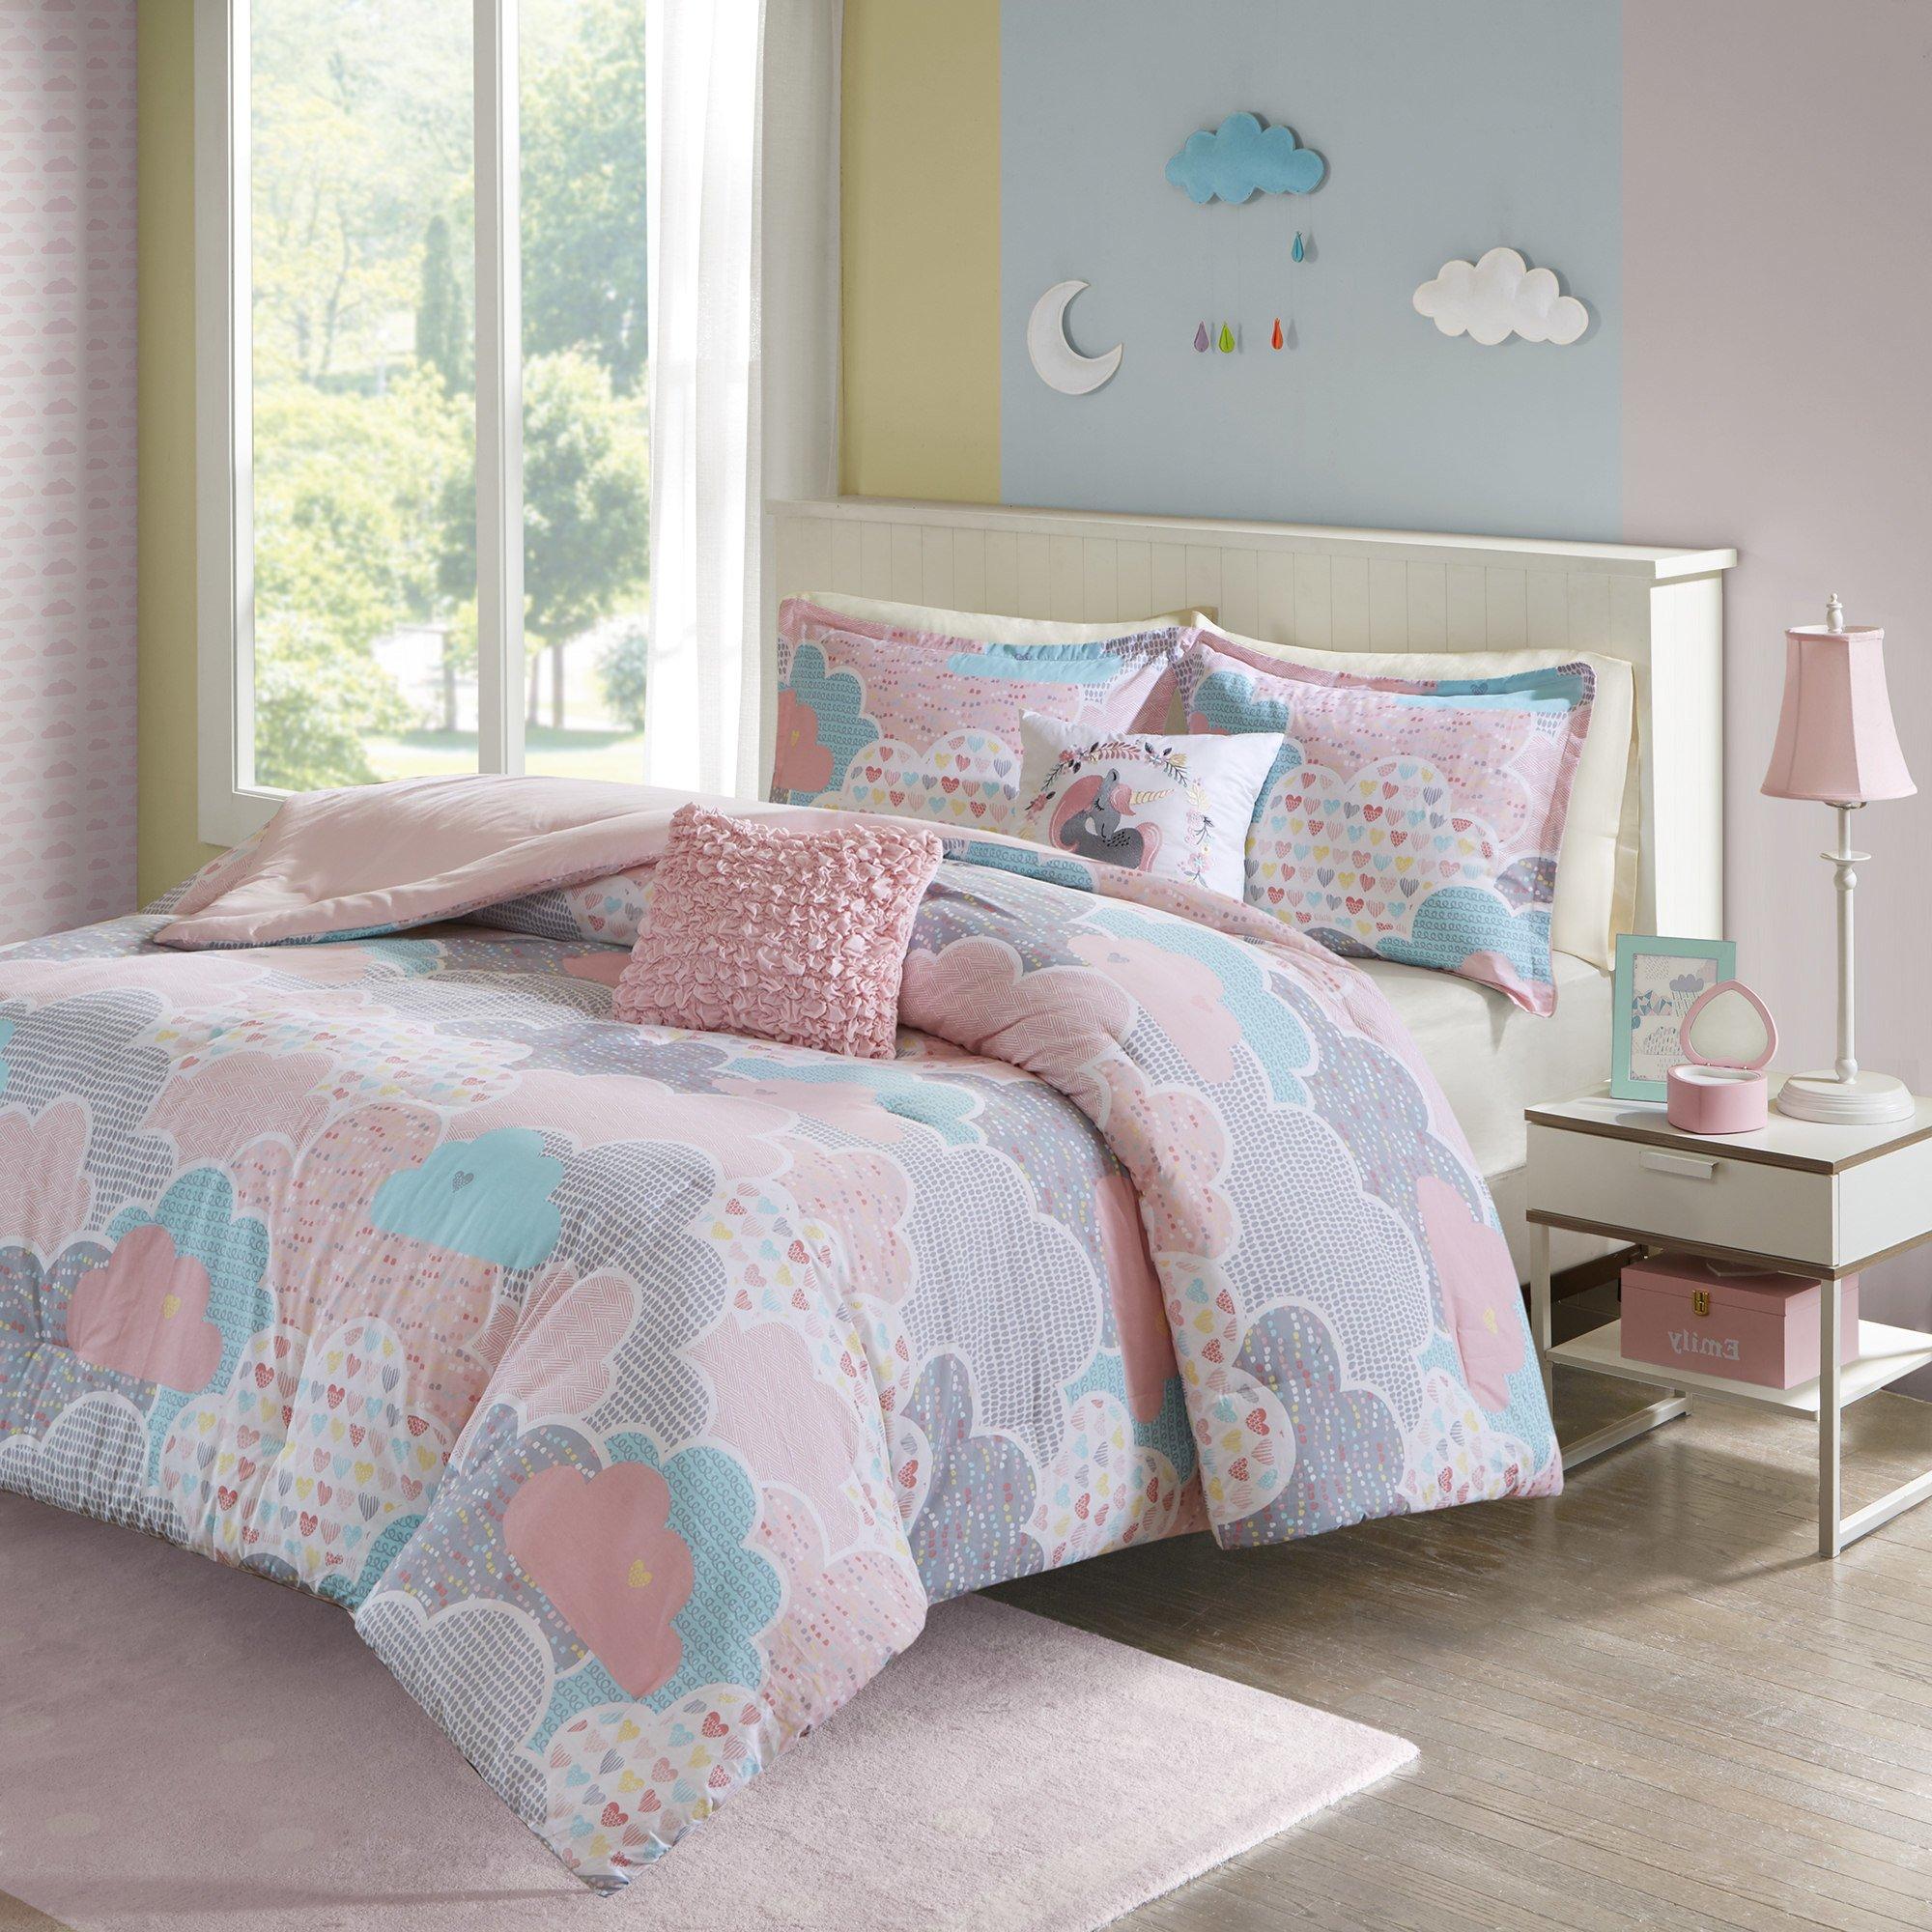 5 Piece Girls Pastel Color Cloud Themed Comforter Full Queen Set, Baby Blue Aqua Light Pink White Grey Sky Clouds Bedding, Playful Fun Polka Dot Heart Love Swirl Dots Pattern, Cotton